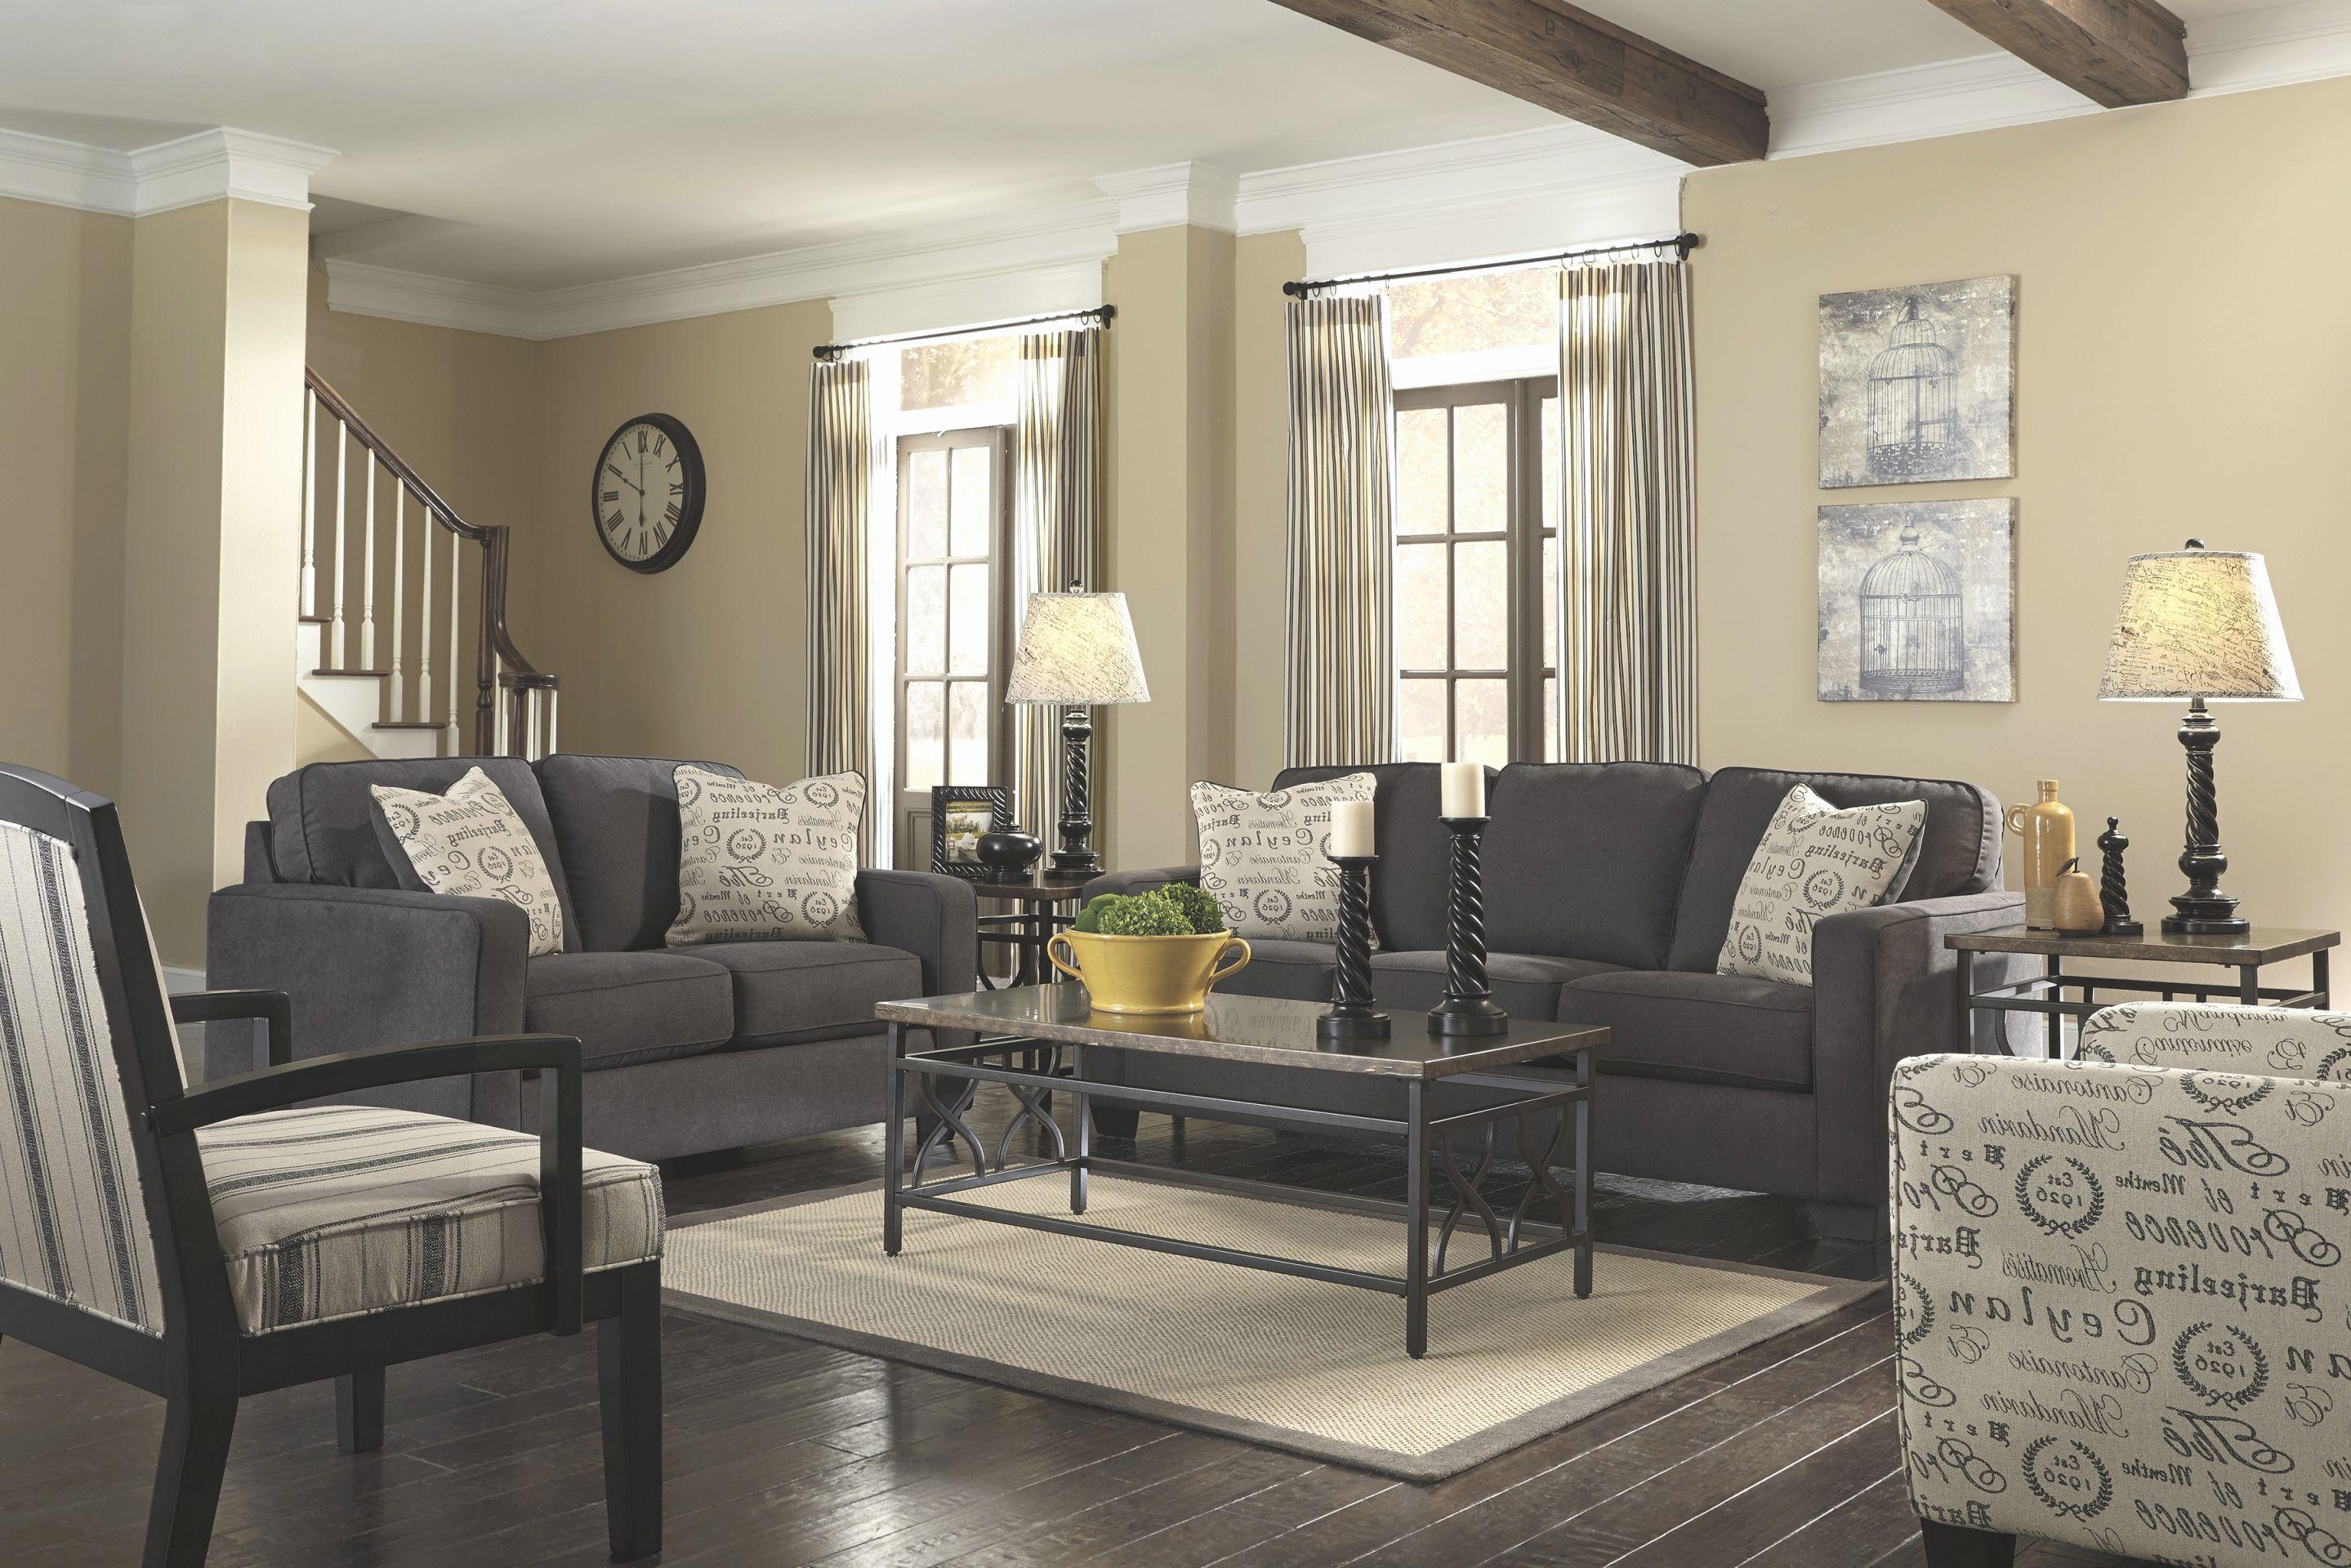 Grey Sofa White Piping Gorgeous Dark Gray Couch Living Room Regarding Dark Gray Couch Living Room Ideas Awesome Decors